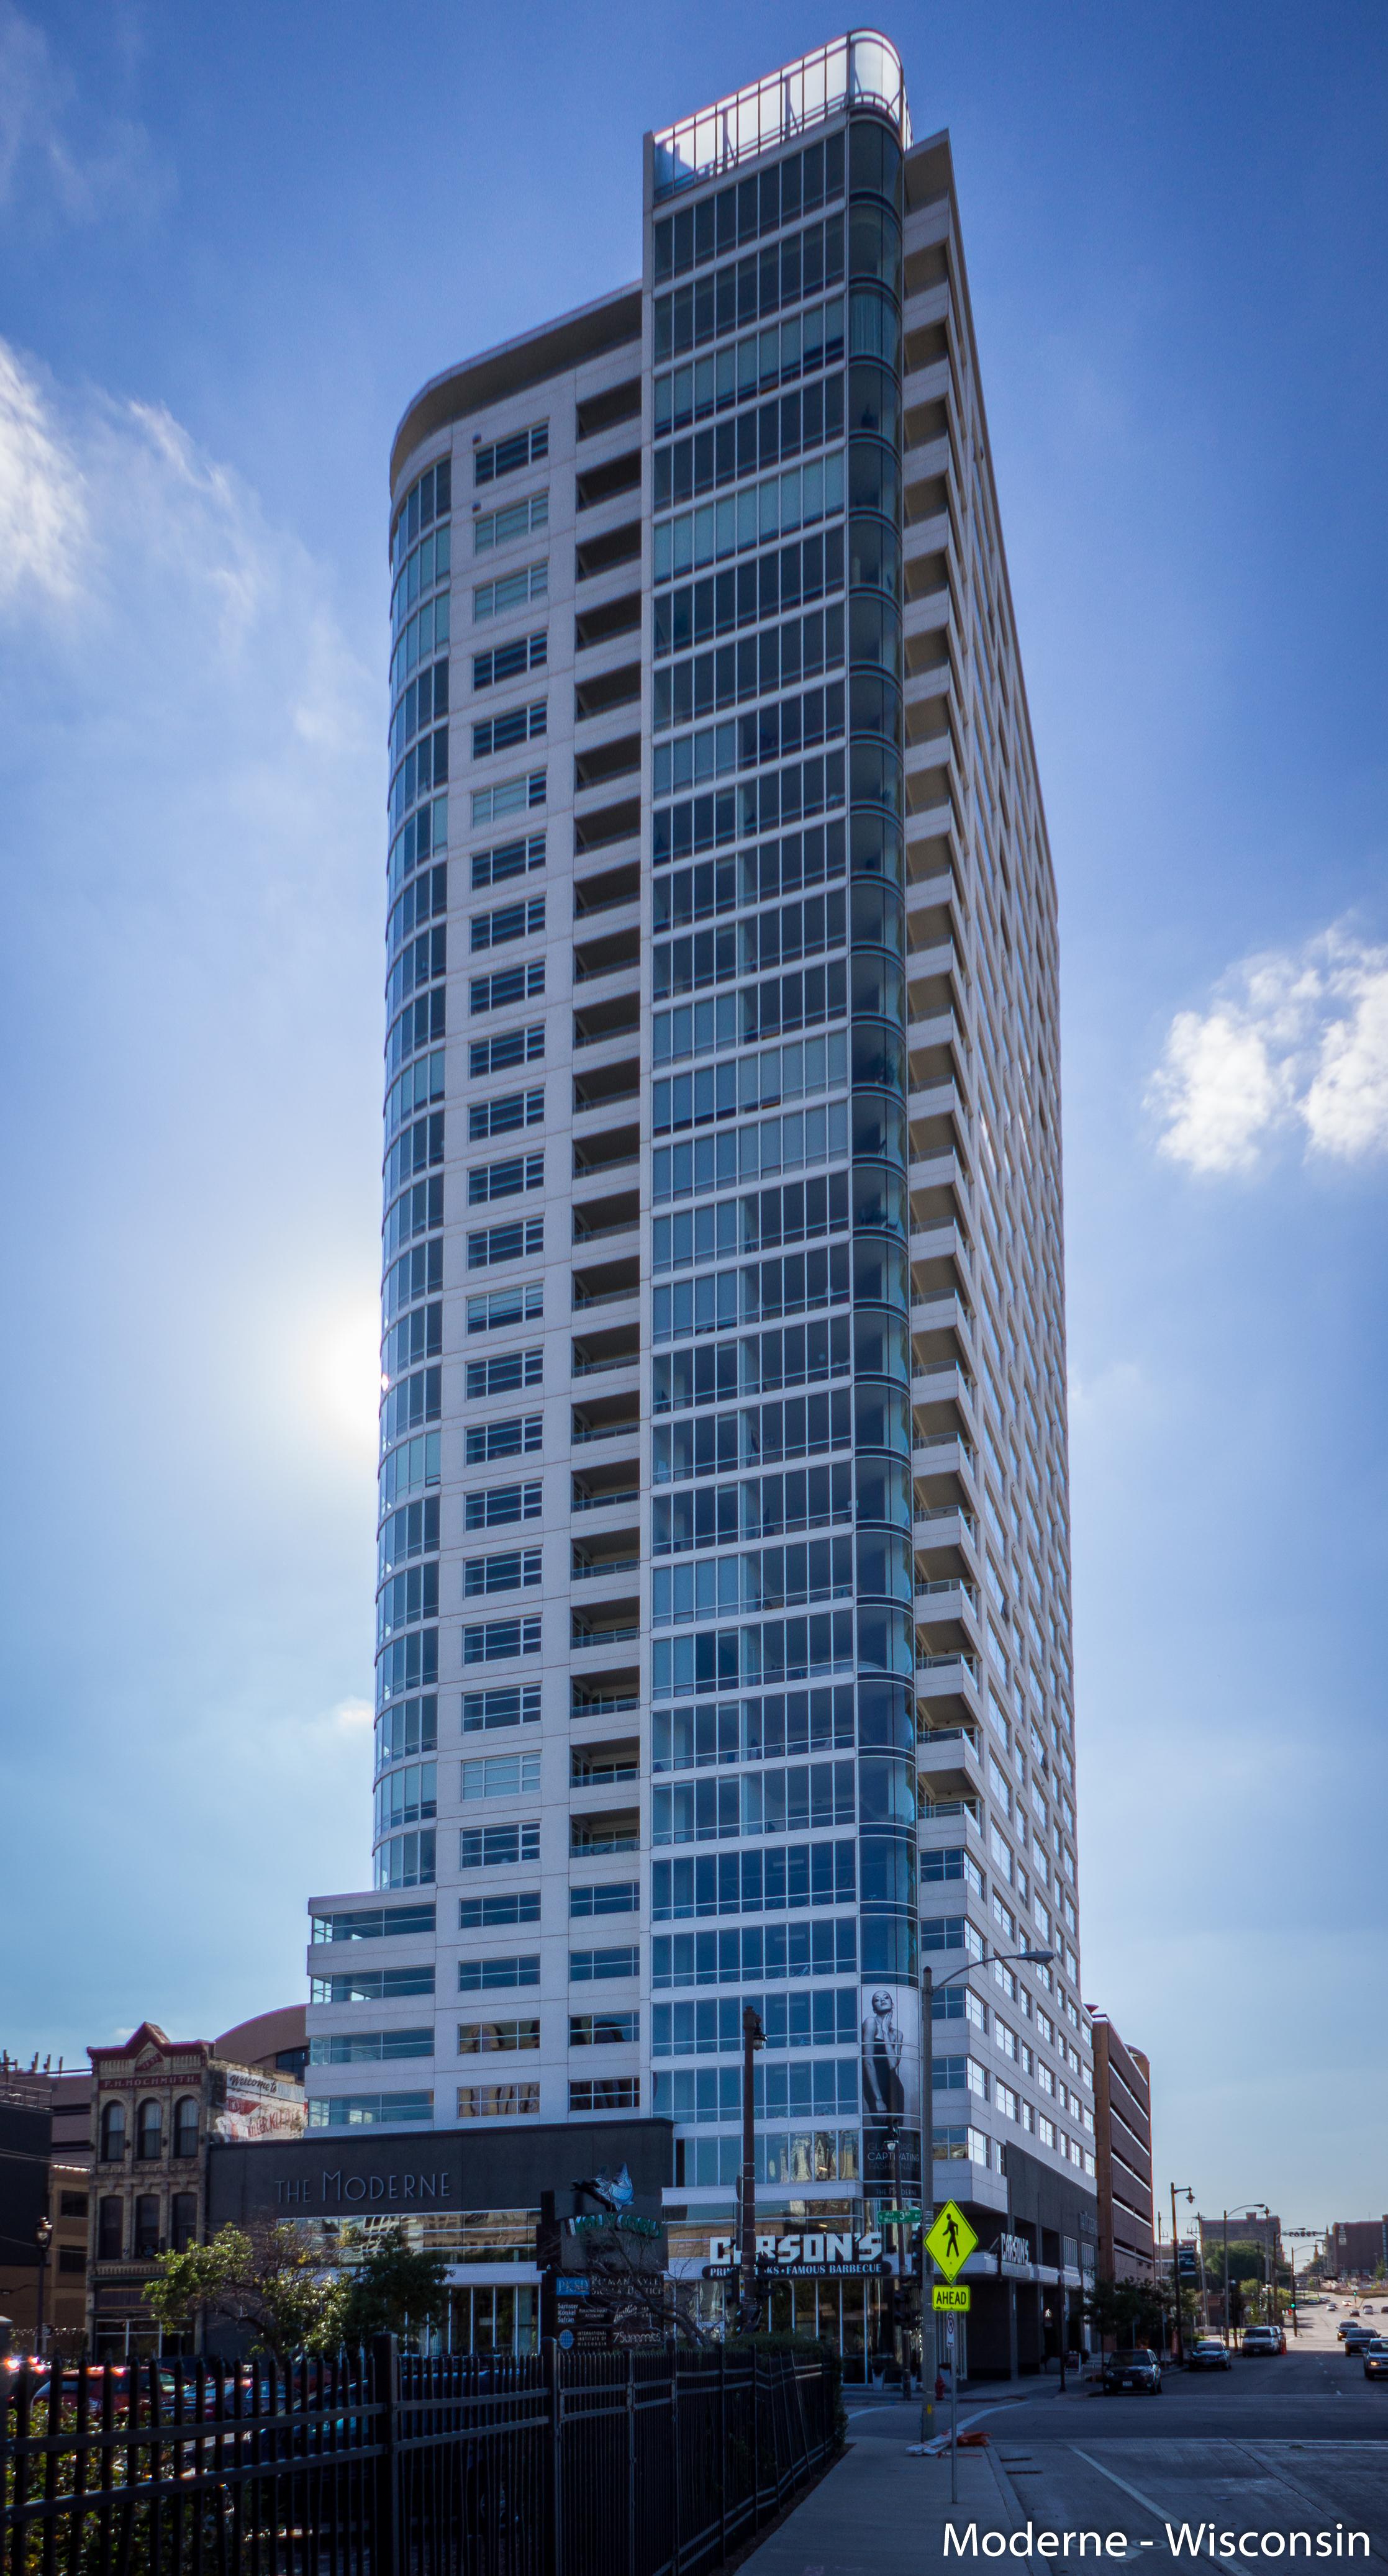 The Moderne - Milwaukee, WI